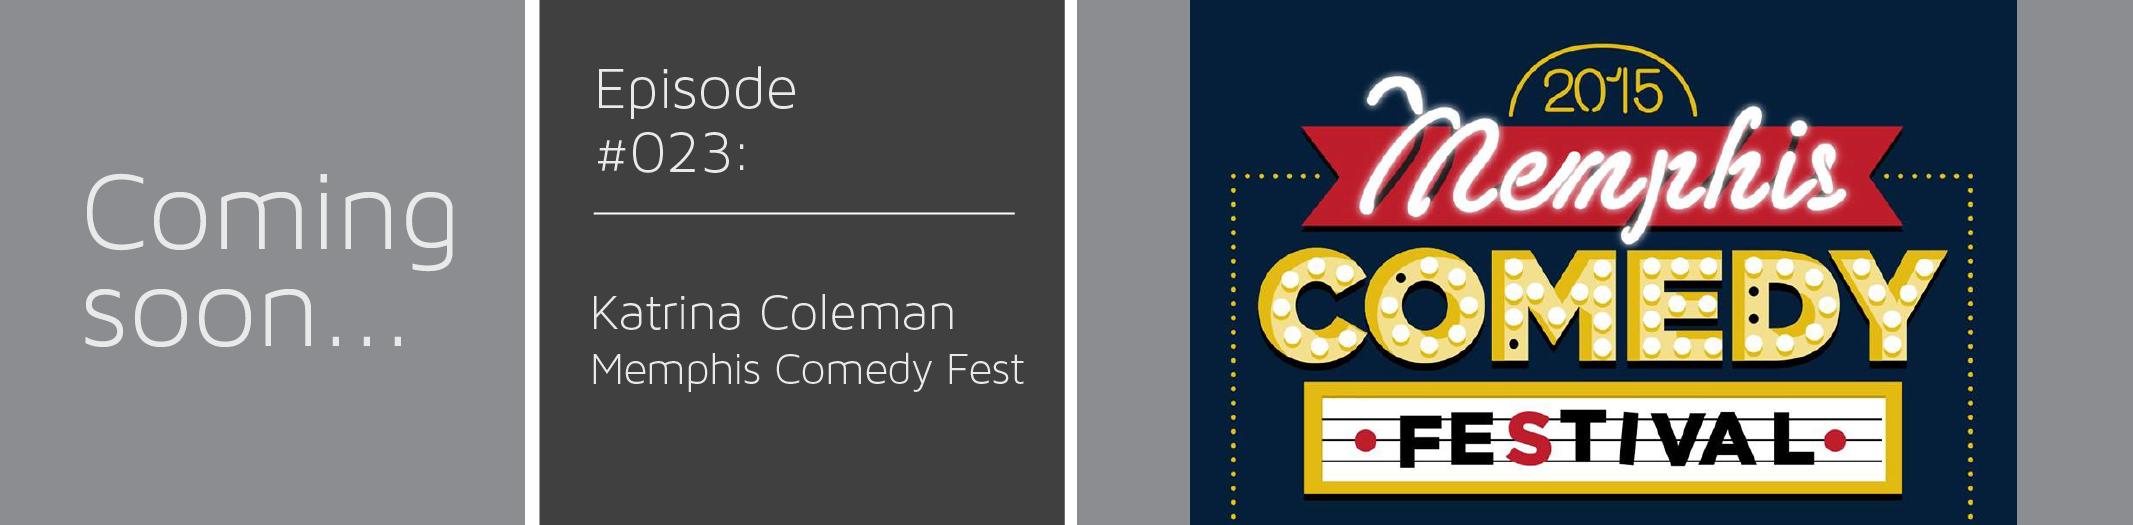 Katrina Coleman | Memphis Comedy Fest